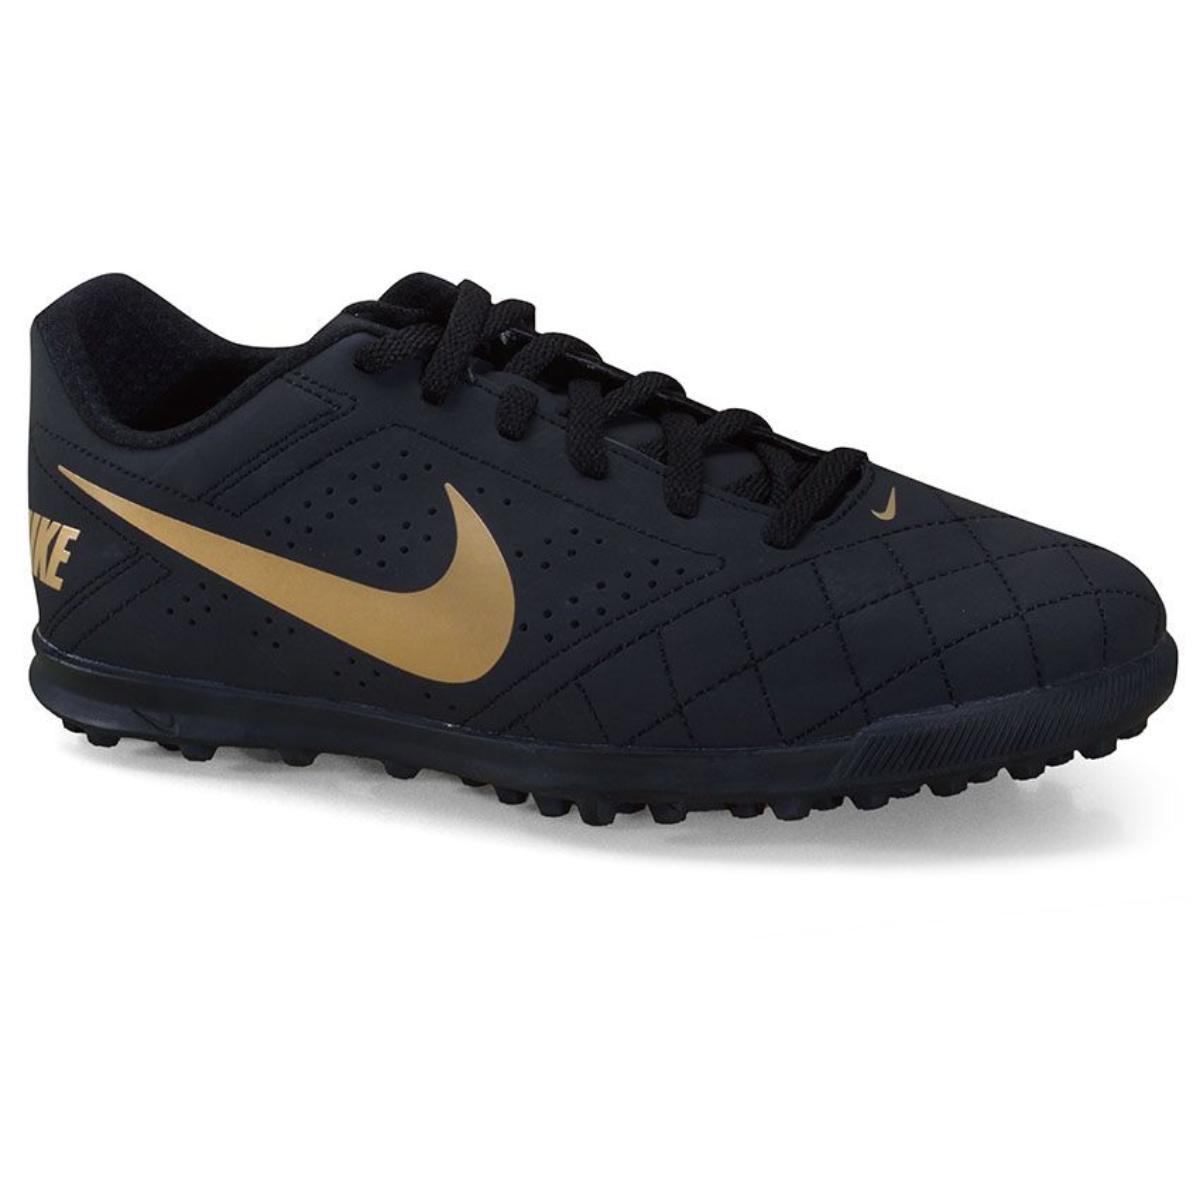 Tênis Masculino Nike Cz0446-071 Beco 2 tf Preto/dourado